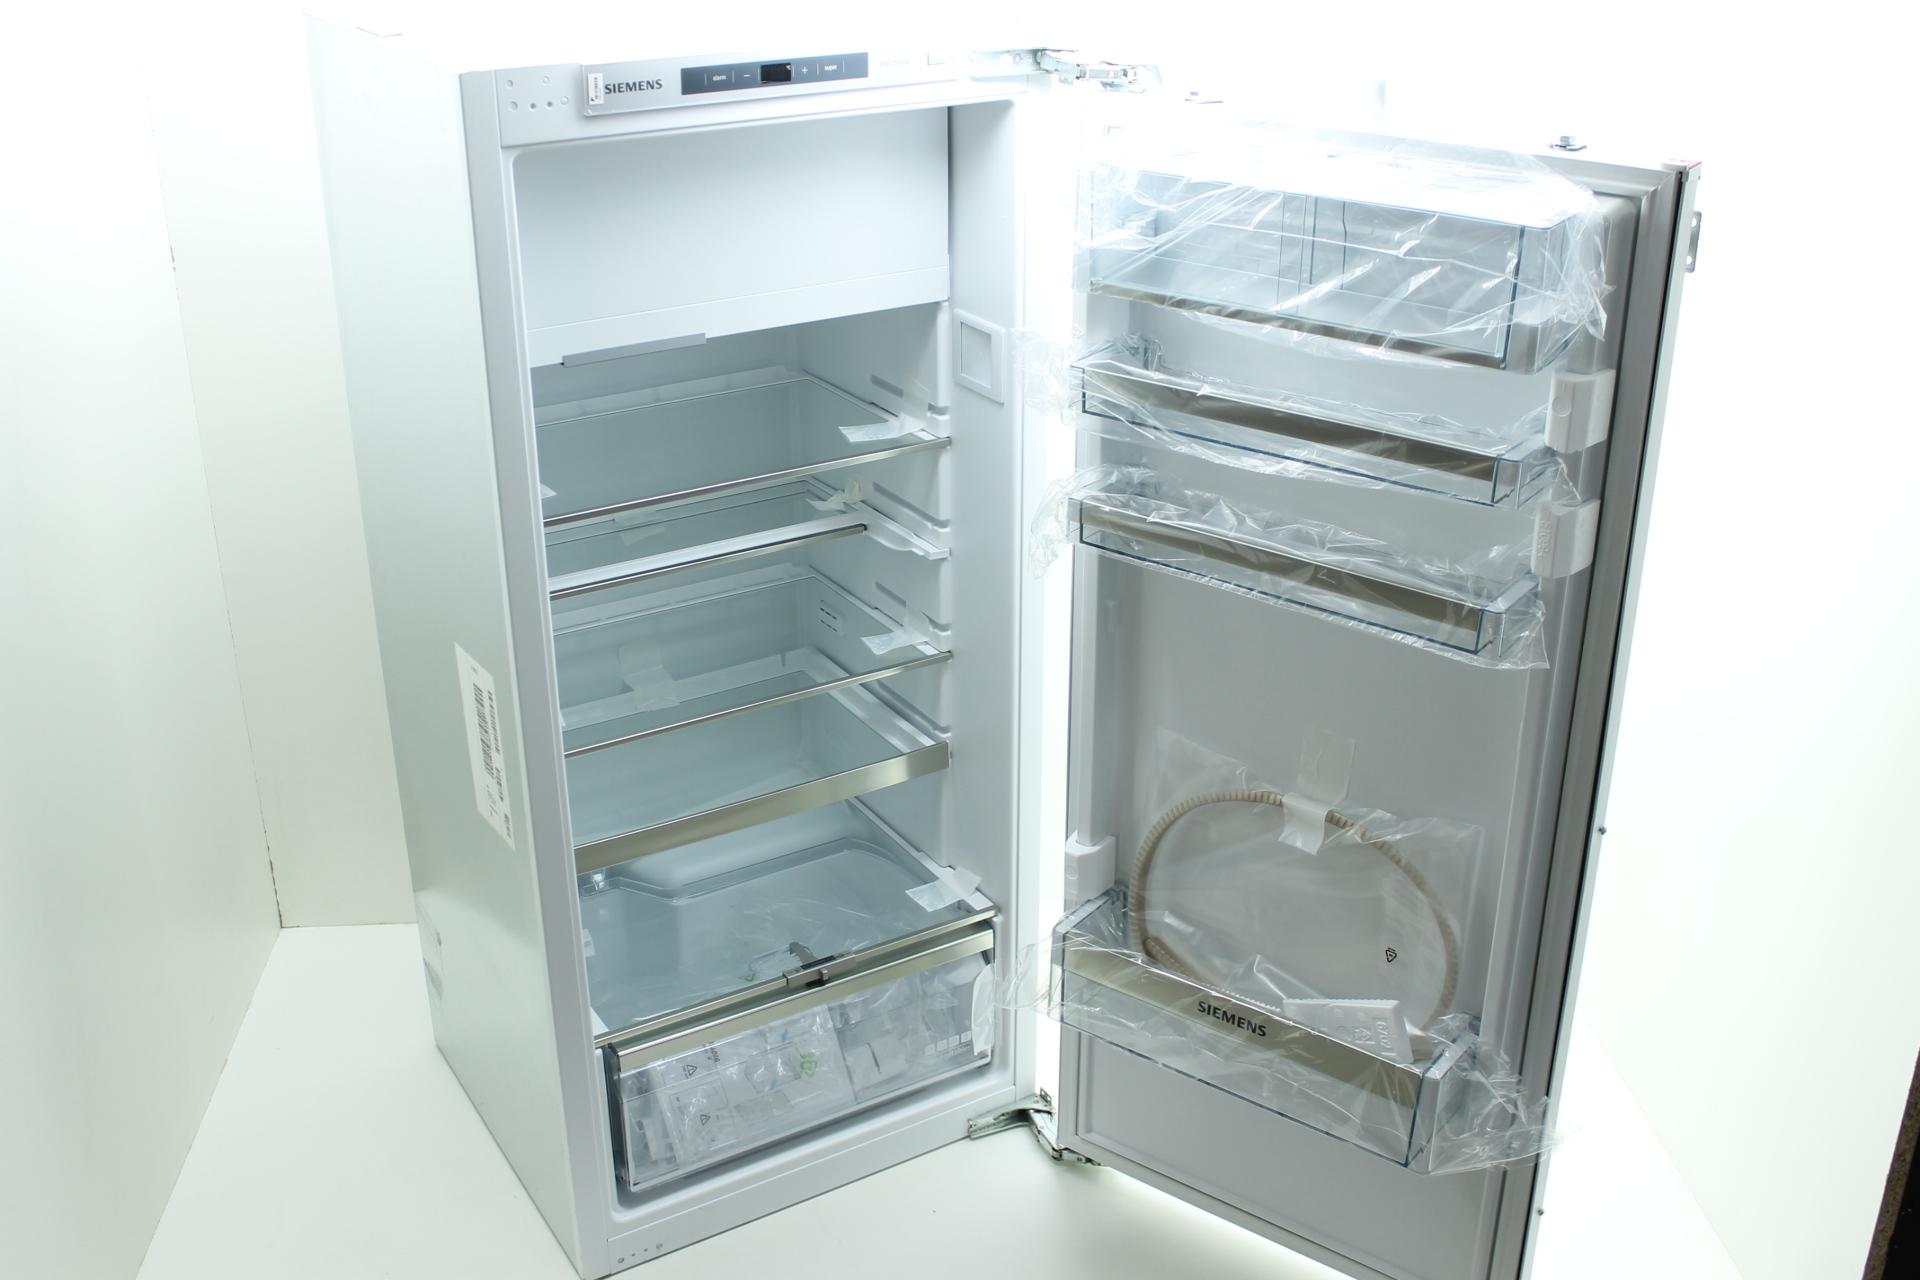 Kühlschrank Aeg Oder Siemens : Siemens kühlschrank einbau kühlautomat ki42laf40 neu unbenutzt